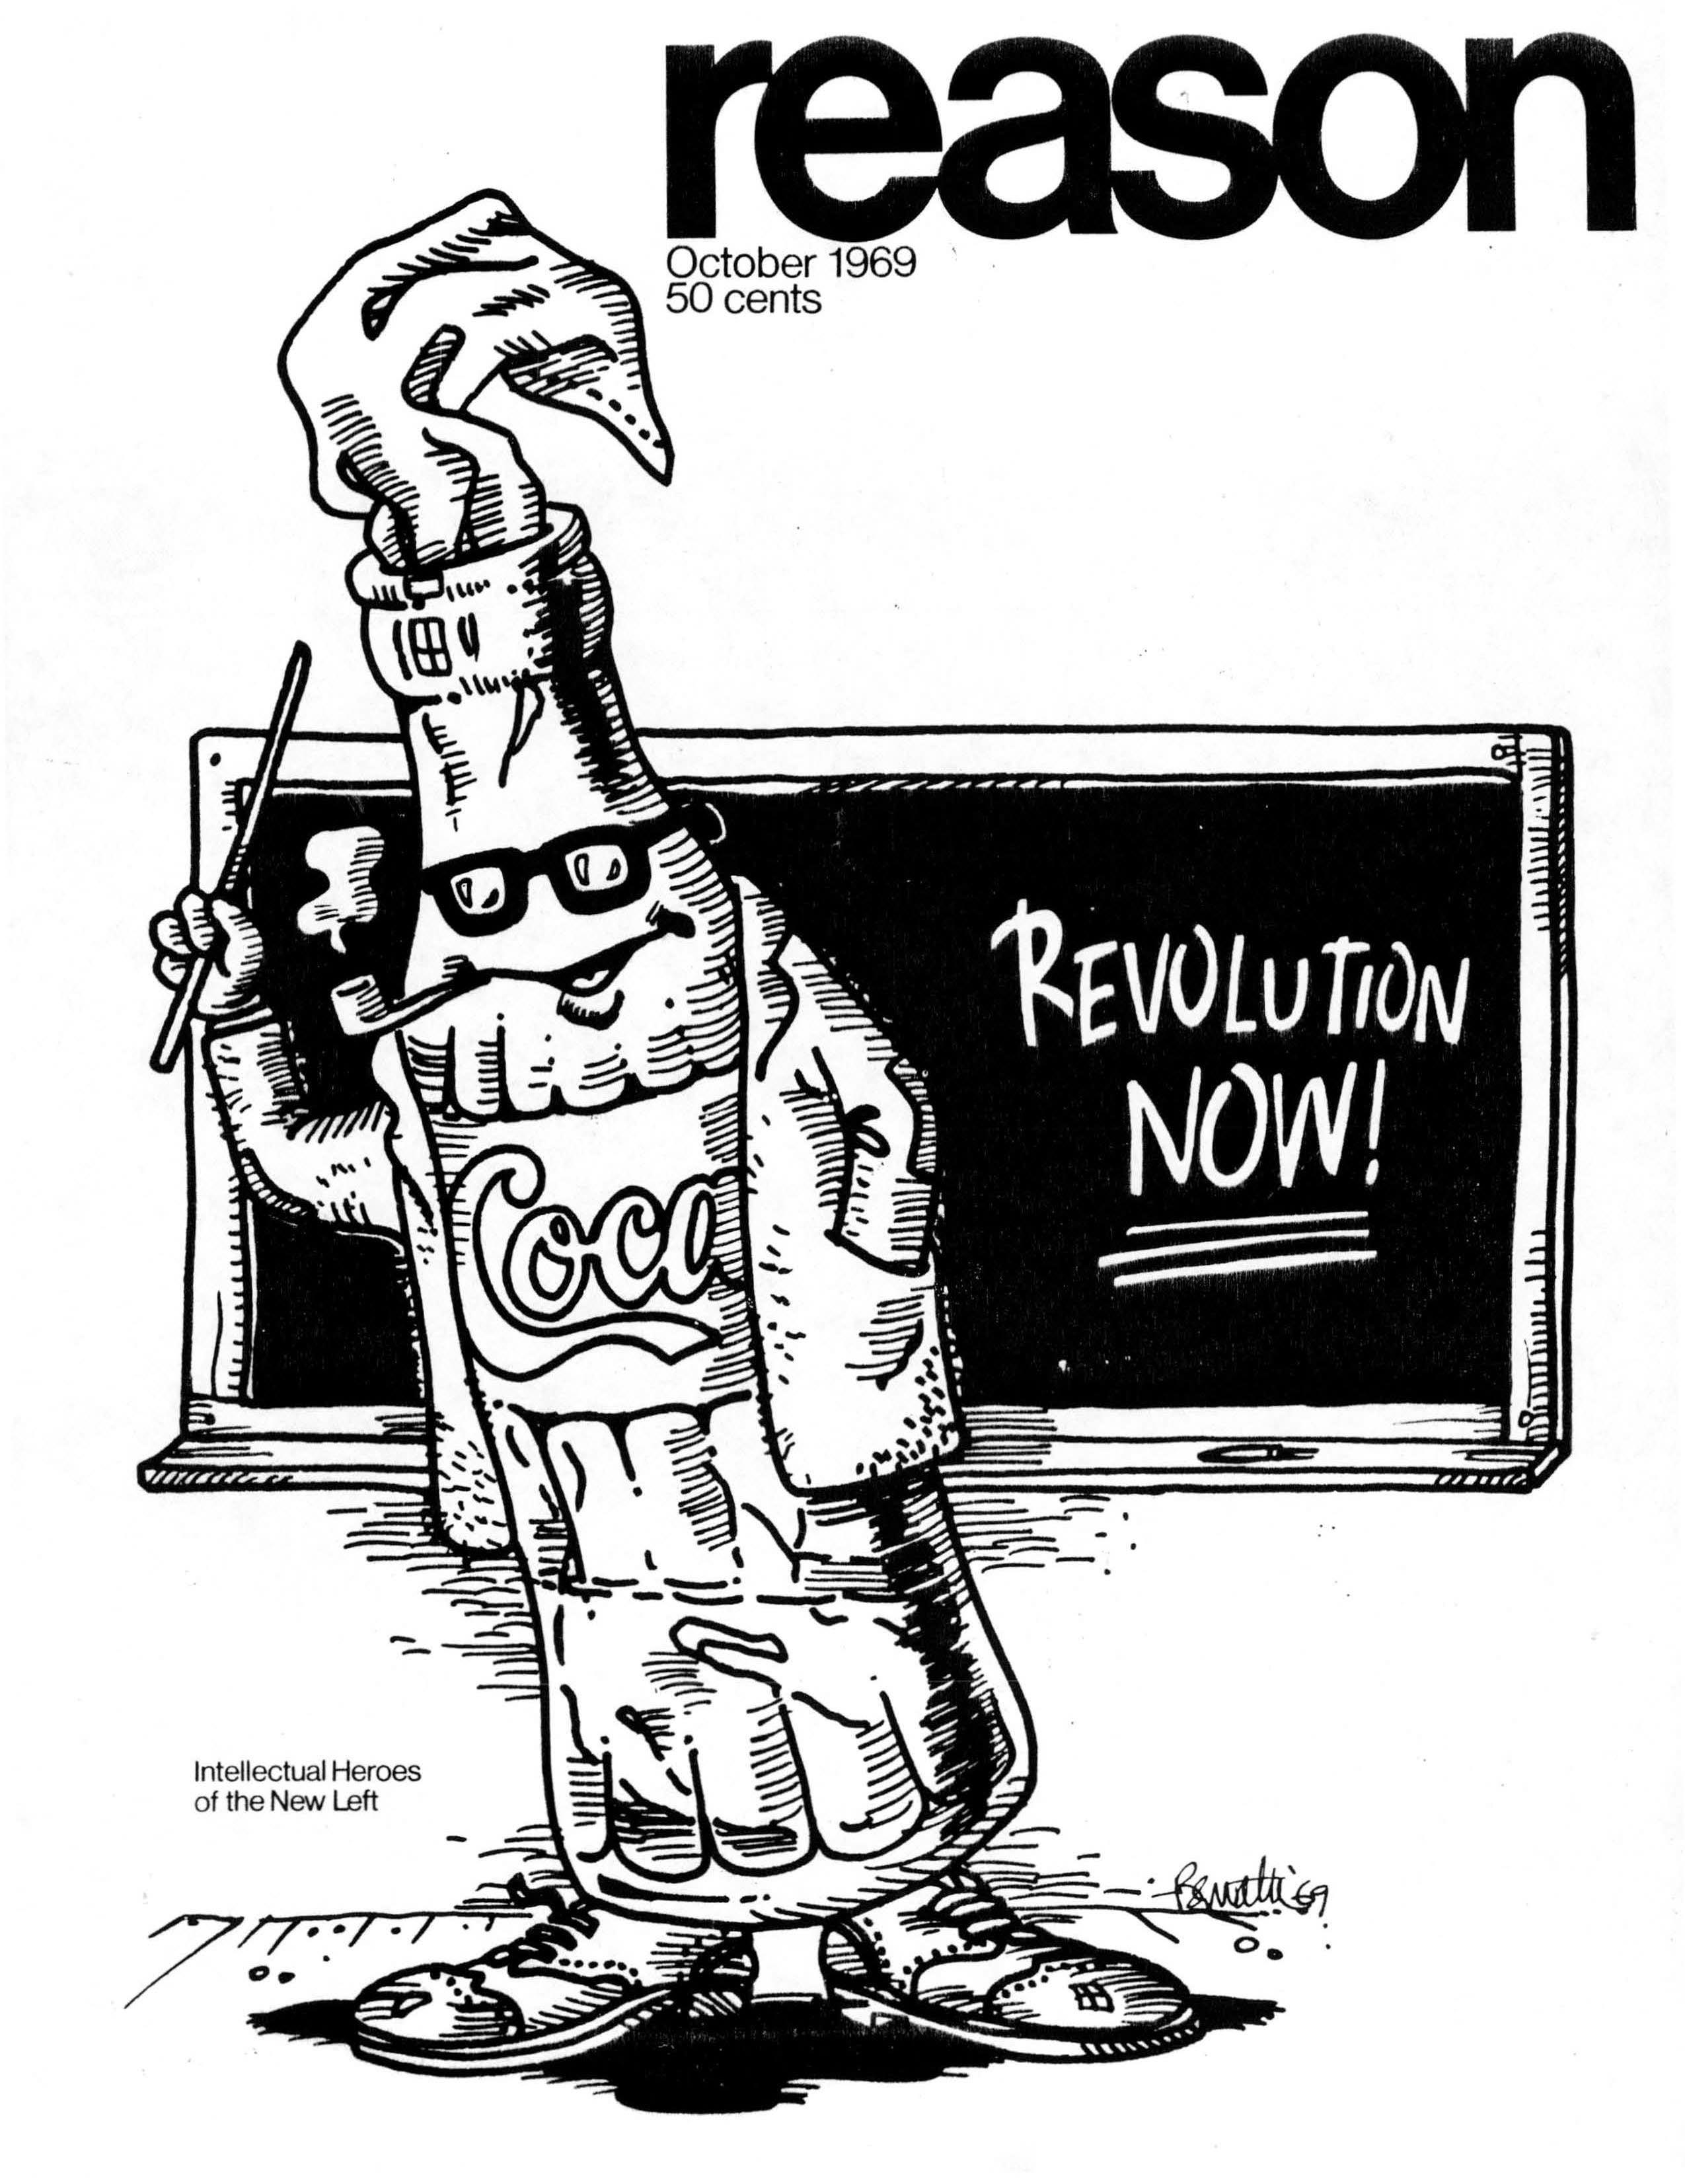 Reason Magazine, October 1969 cover image